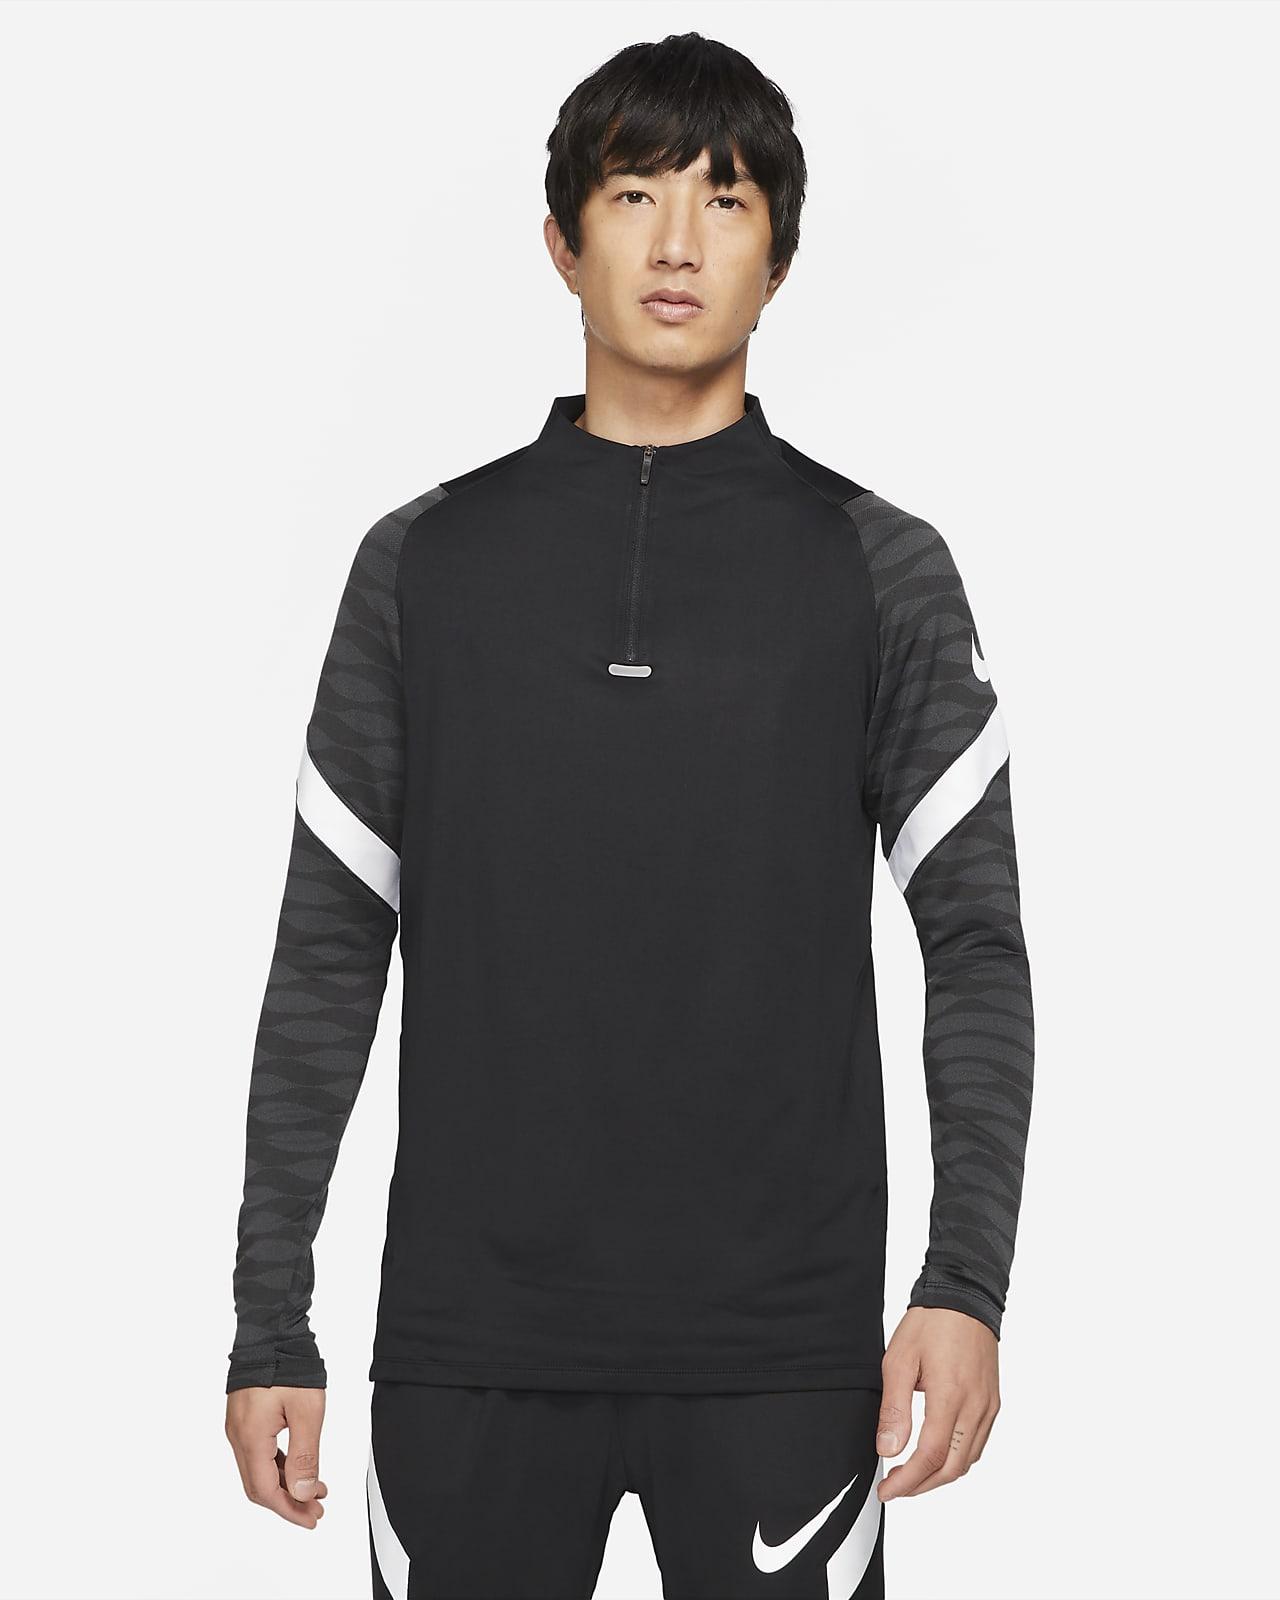 Pánské fotbalové tréninkové tričko Nike Dri-FIT Strike se čtvrtinovým zipem